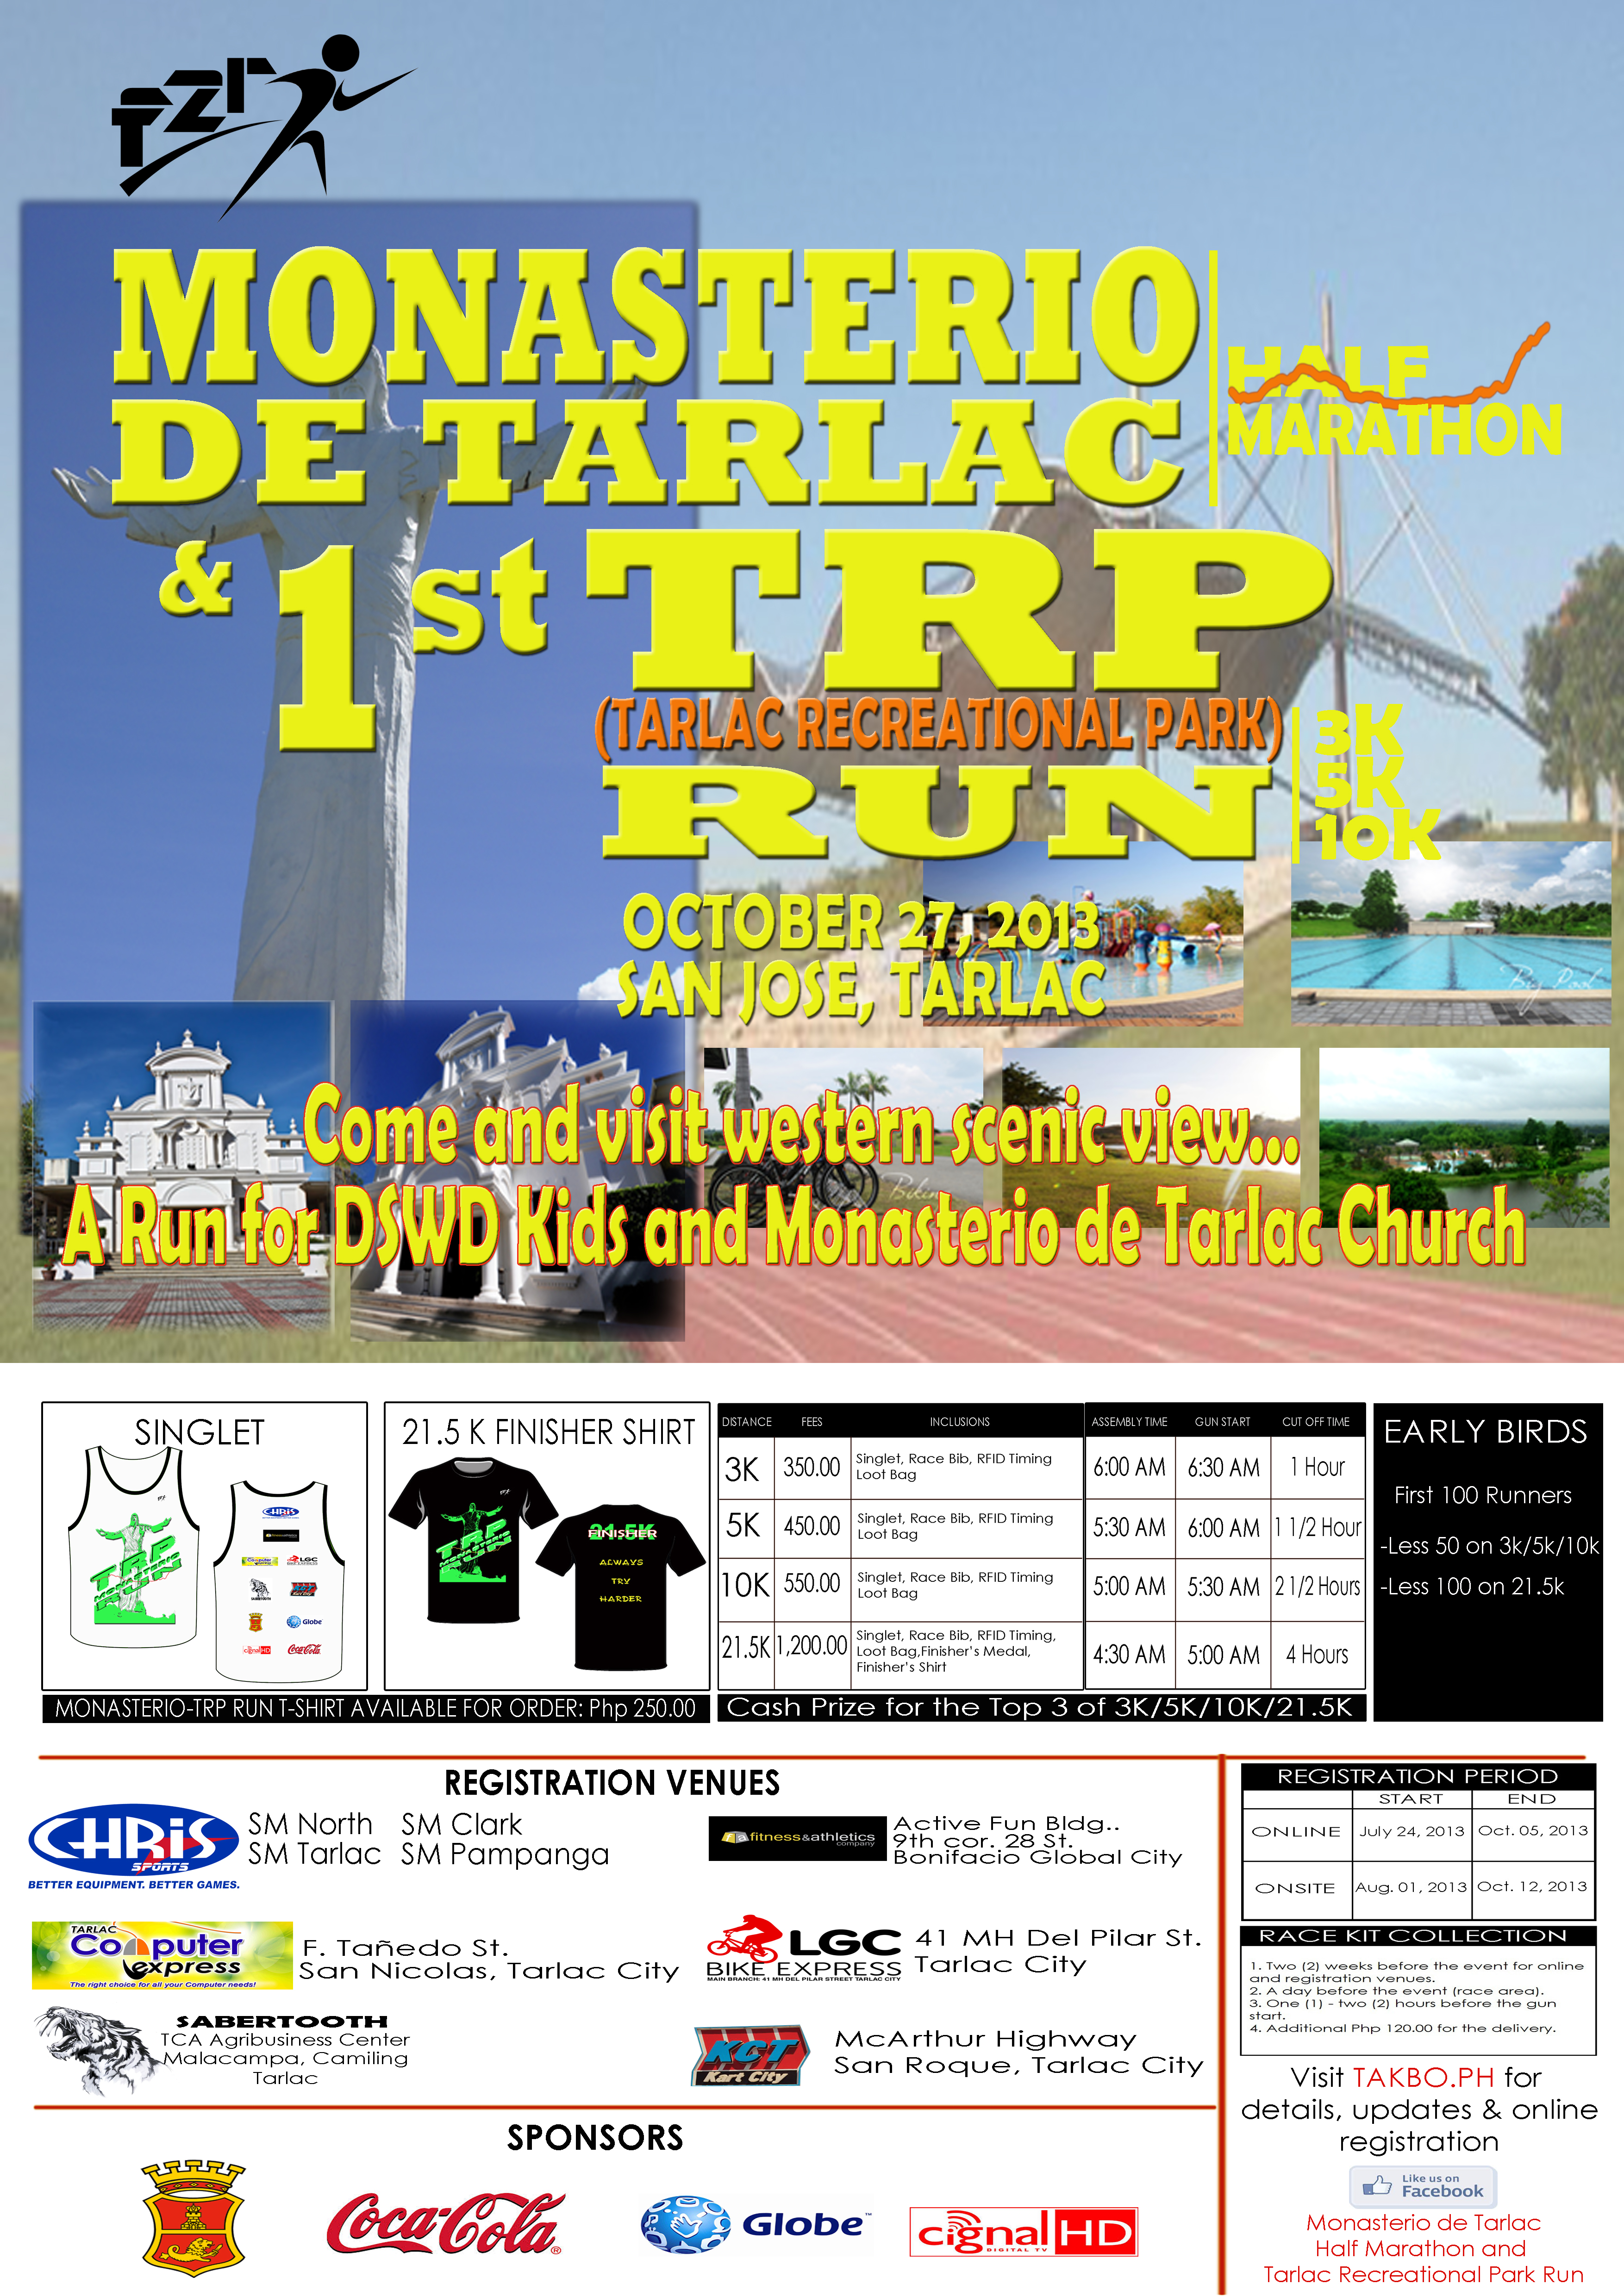 monasterio-de-tarlac-half-marathon-2013-poster